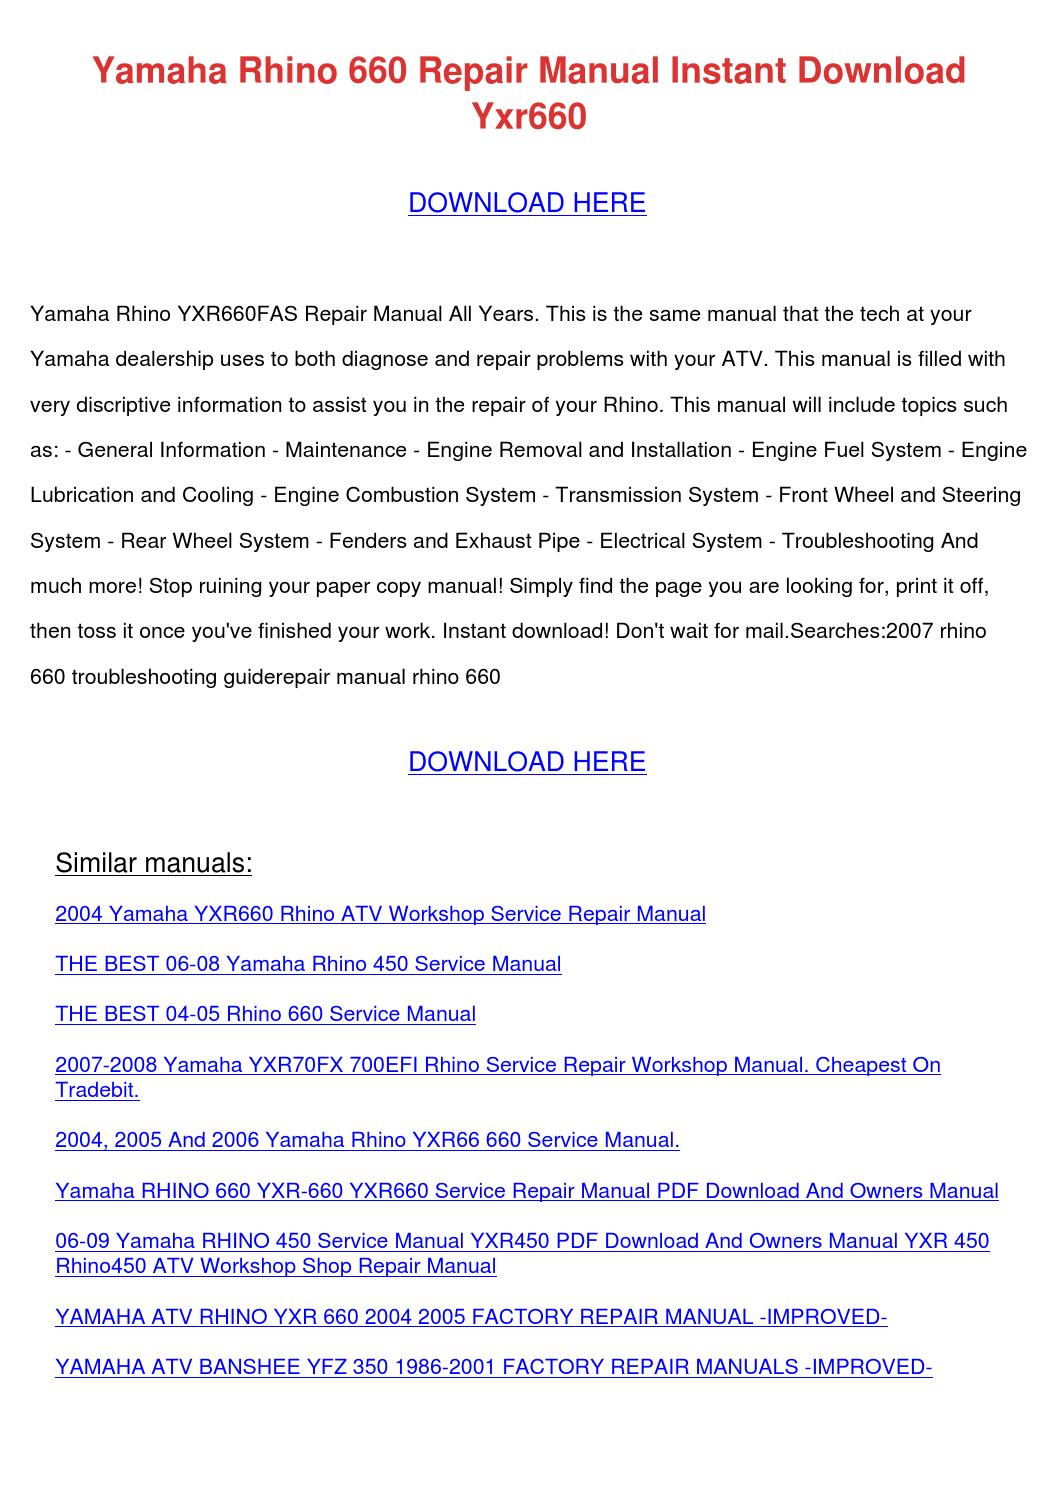 yamaha rhino 660 repair manual instant downlo by shanonsamples issuu rh issuu com yamaha rhino service manual free download yamaha rhino service manual pdf